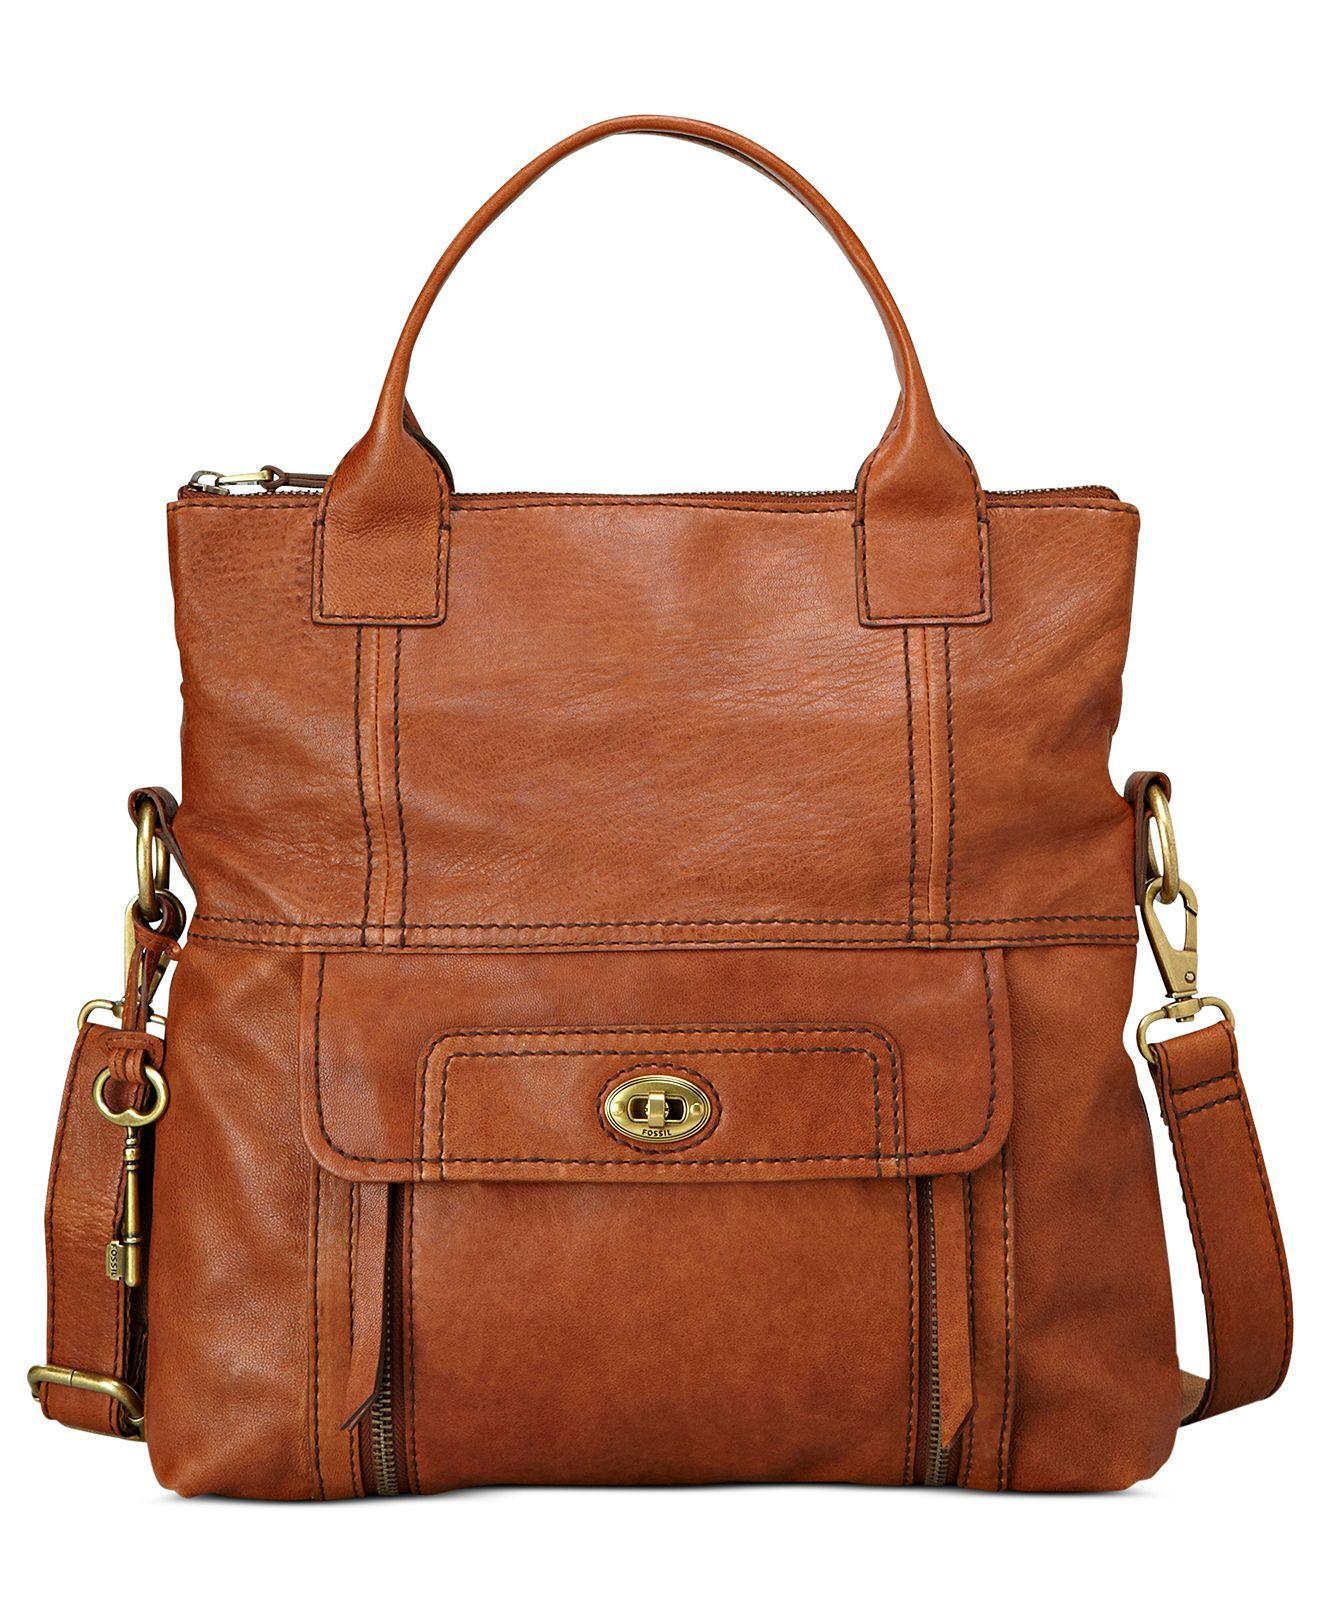 8d62998bd1c933 Fossil Handbag, Stanton Leather Tote - Fossil - Handbags & Accessories -  Macy's